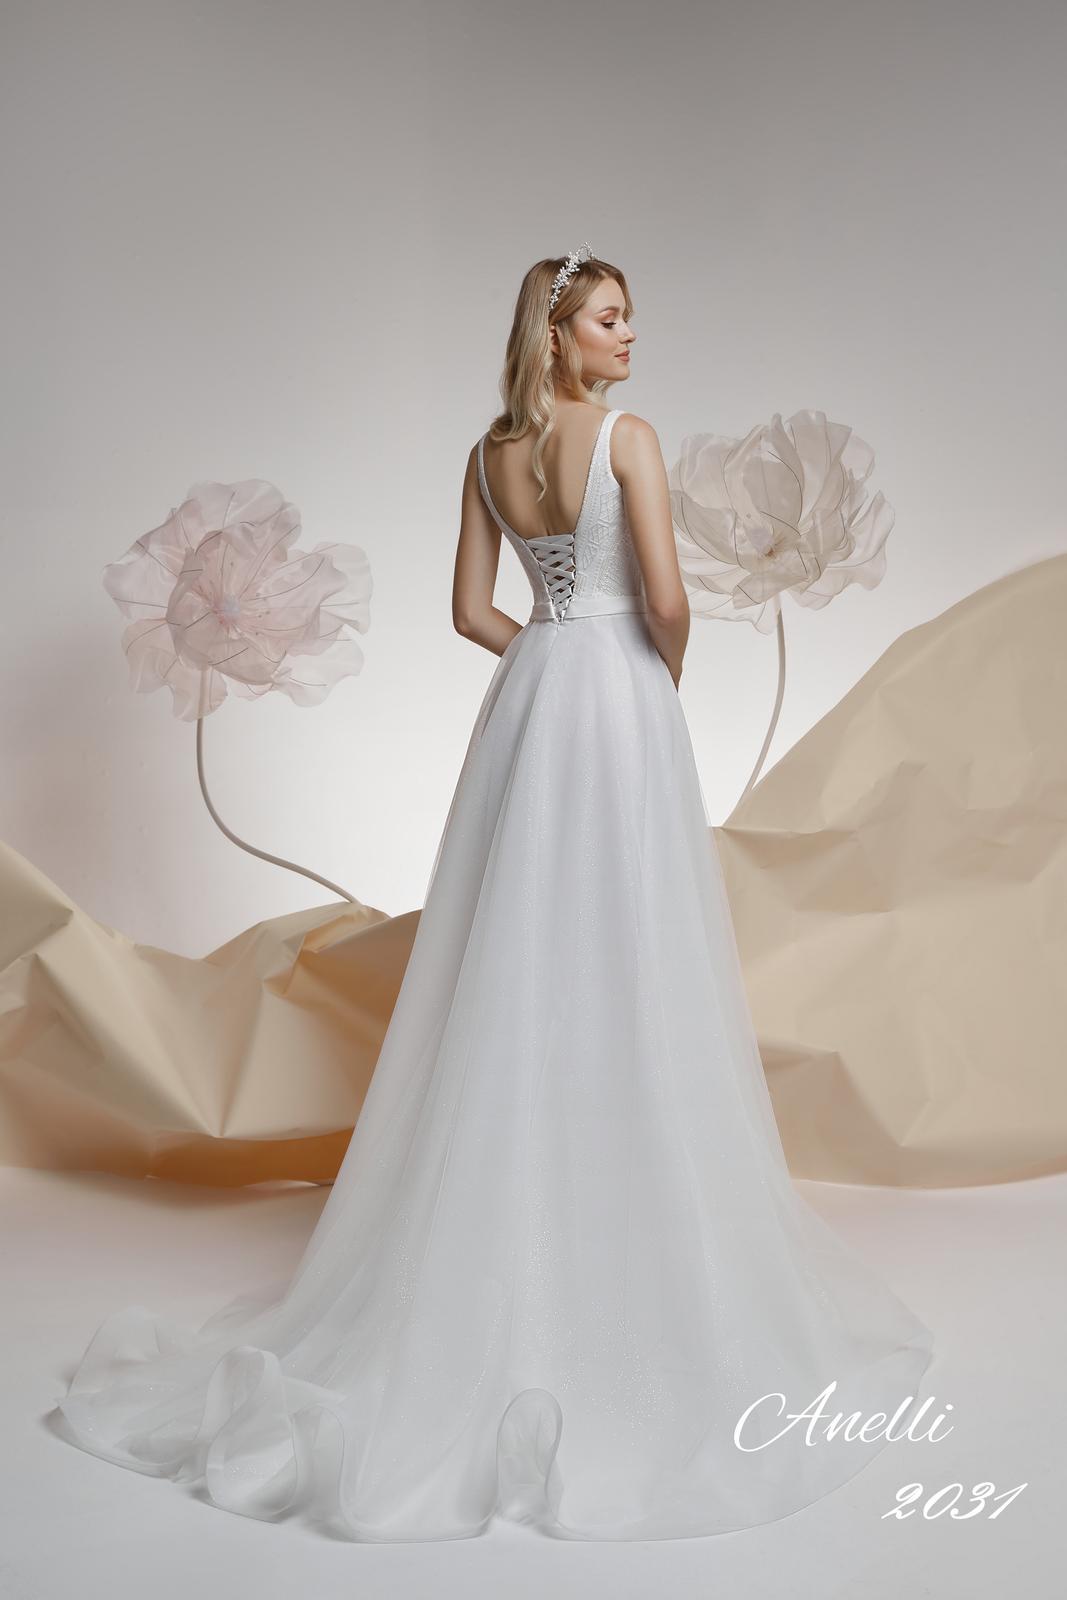 Svadobné šaty - Imagine 2031 - Obrázok č. 2